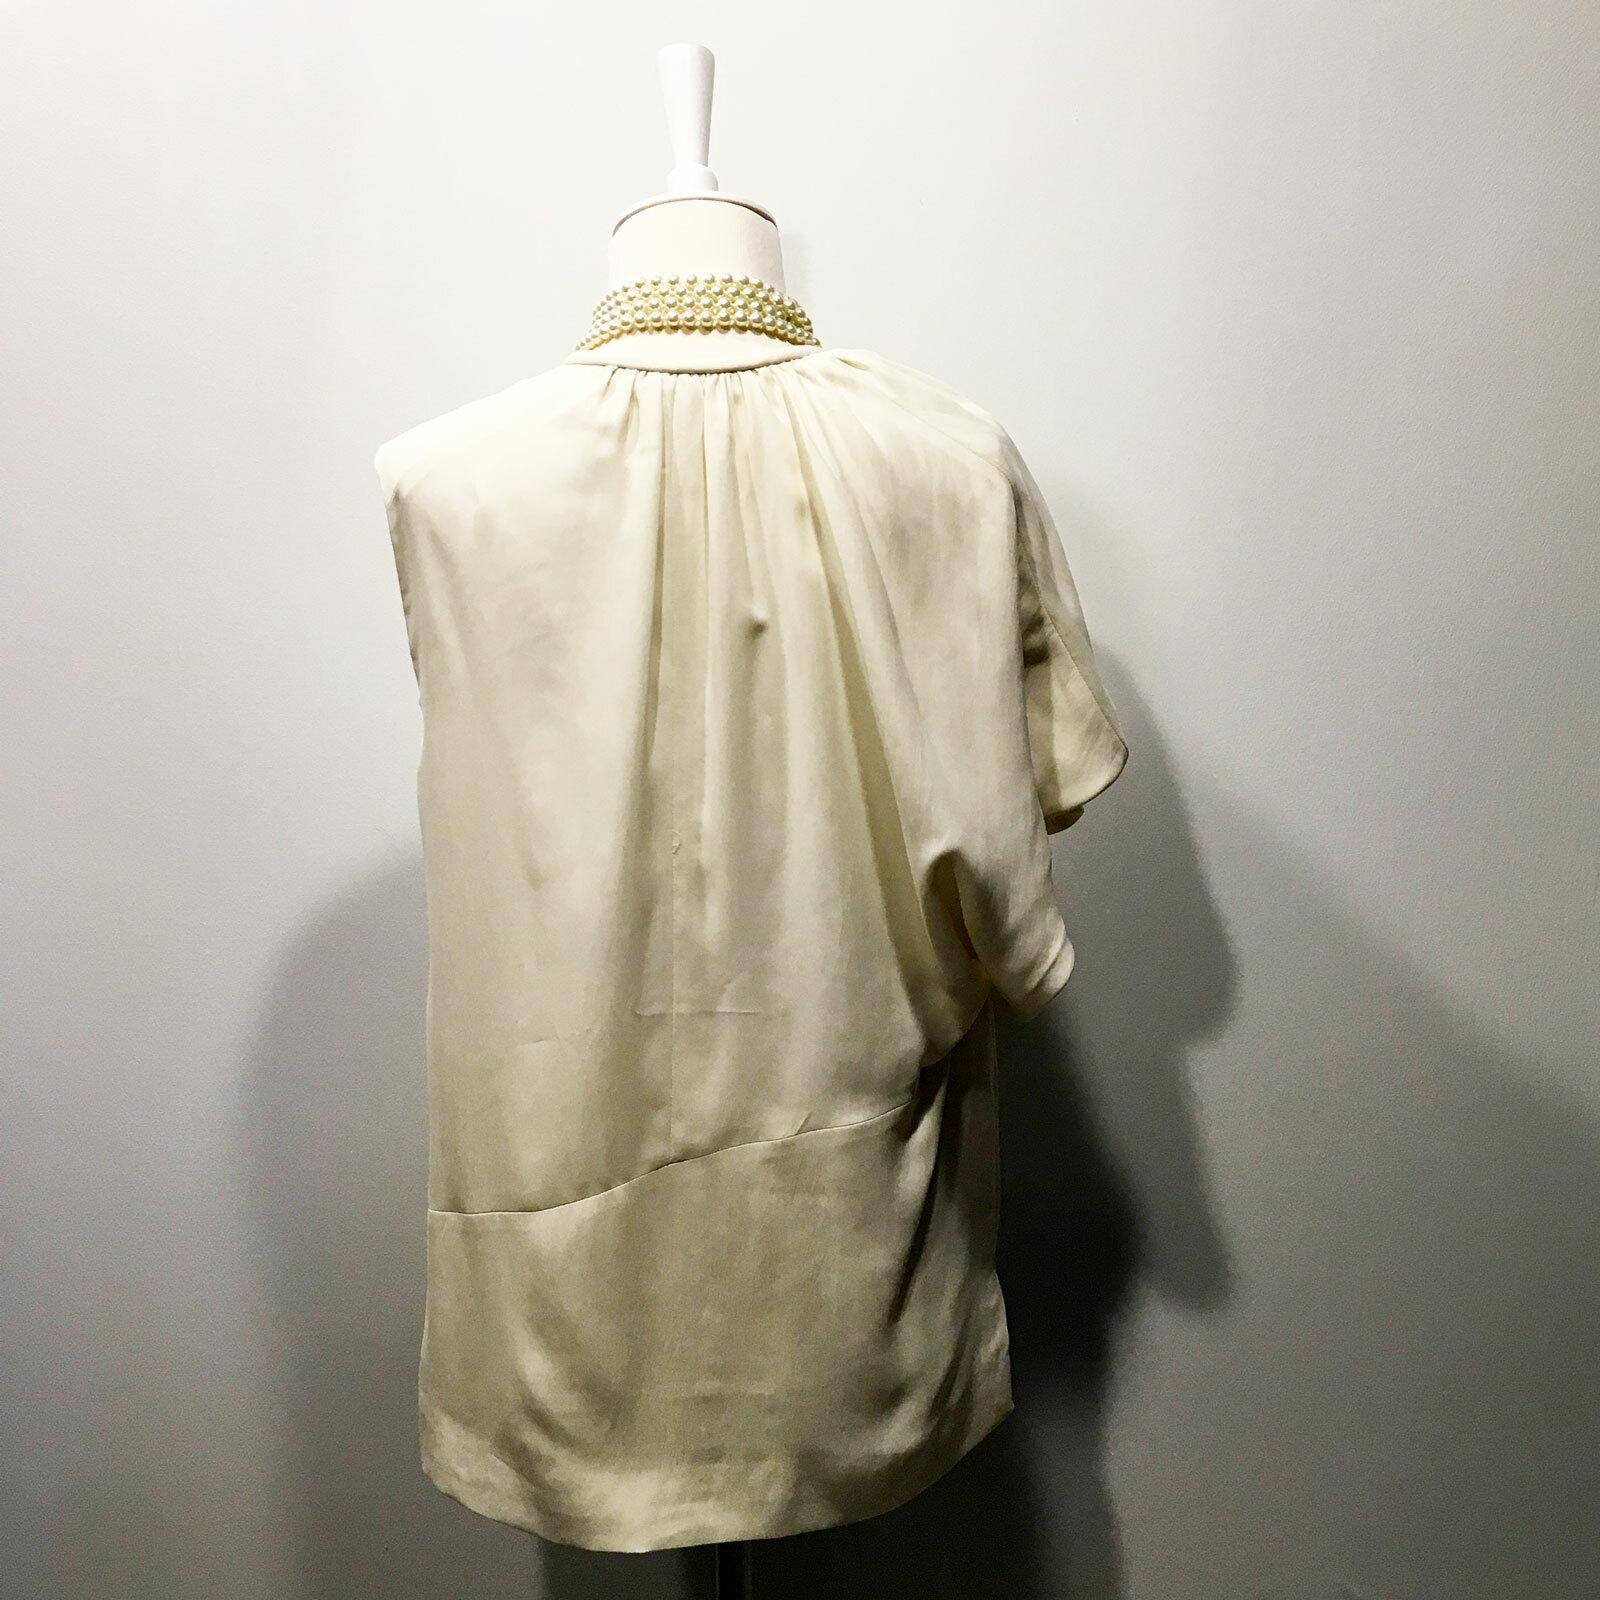 Balenciaga | $945 Ivory One-Shoulder  Pleated Dra… - image 6